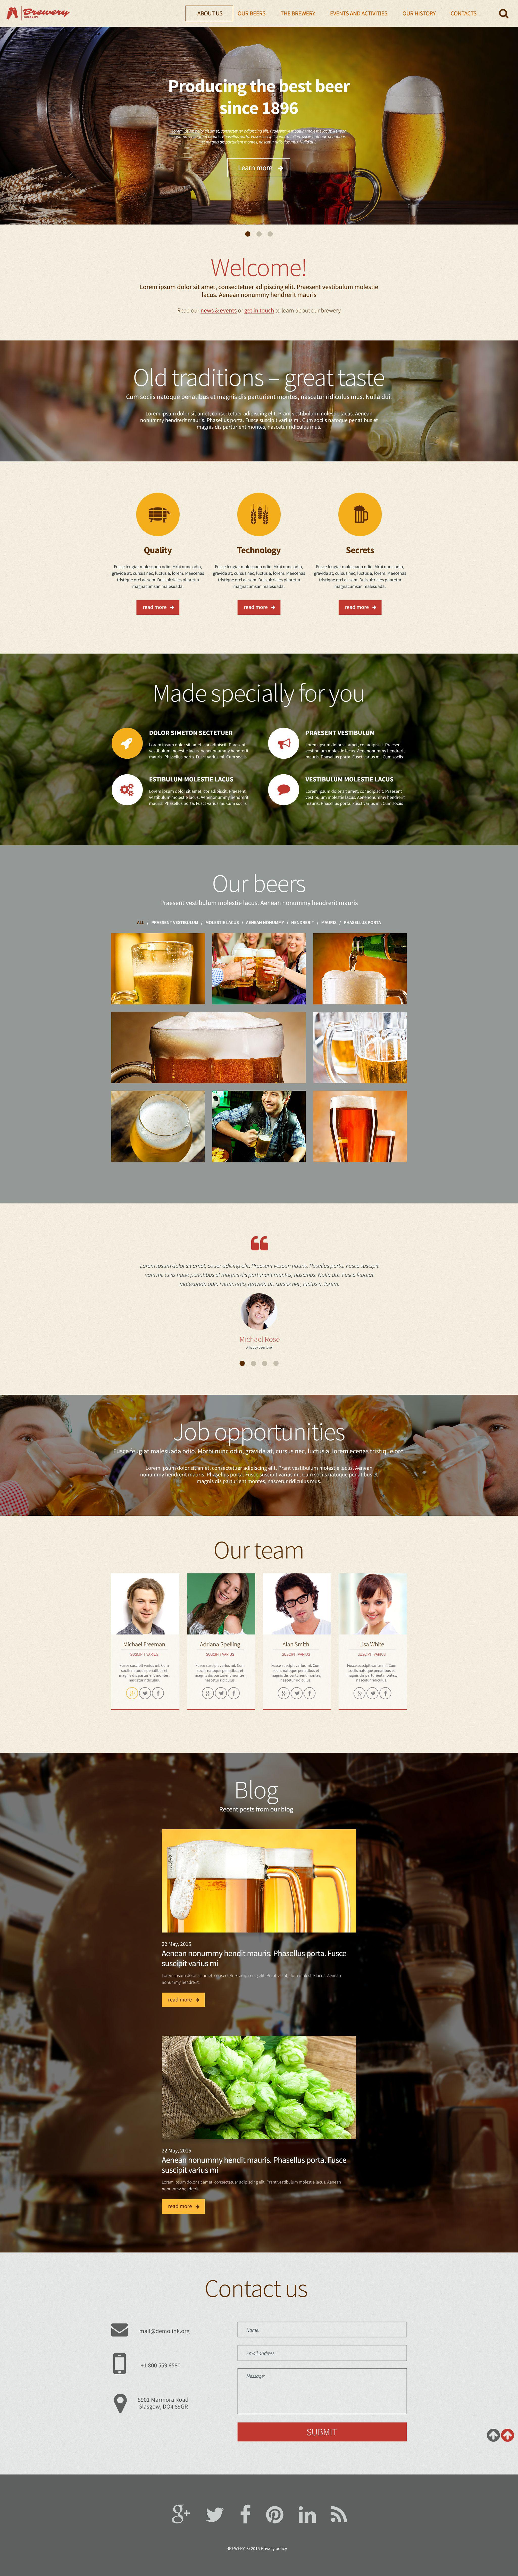 Brewery №55486